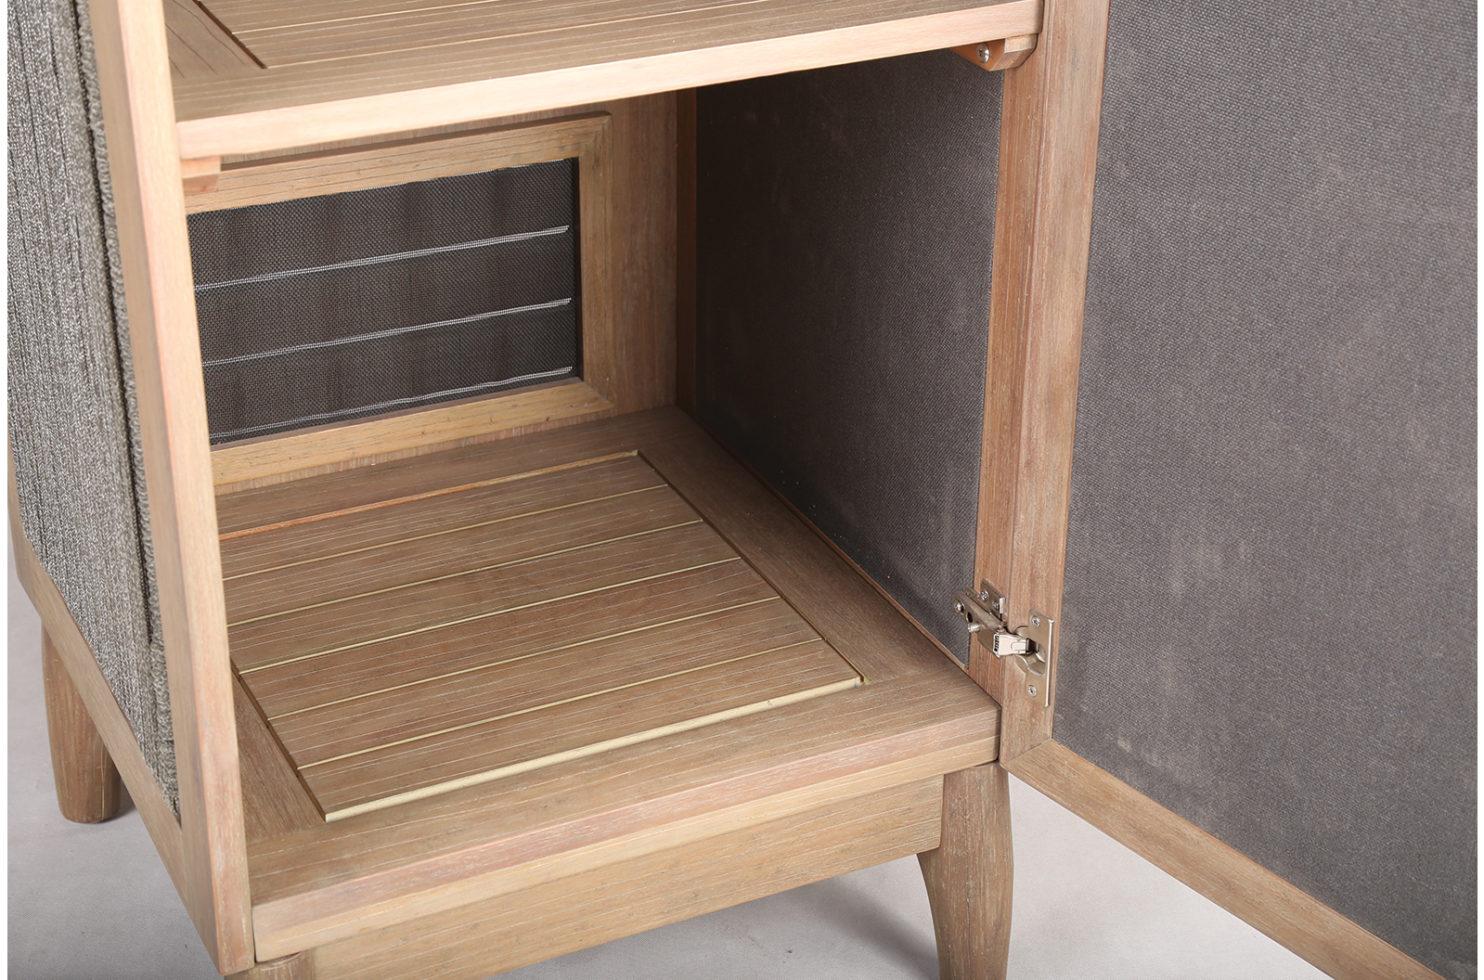 wings cabinet 504FT420P2G E dtl 01